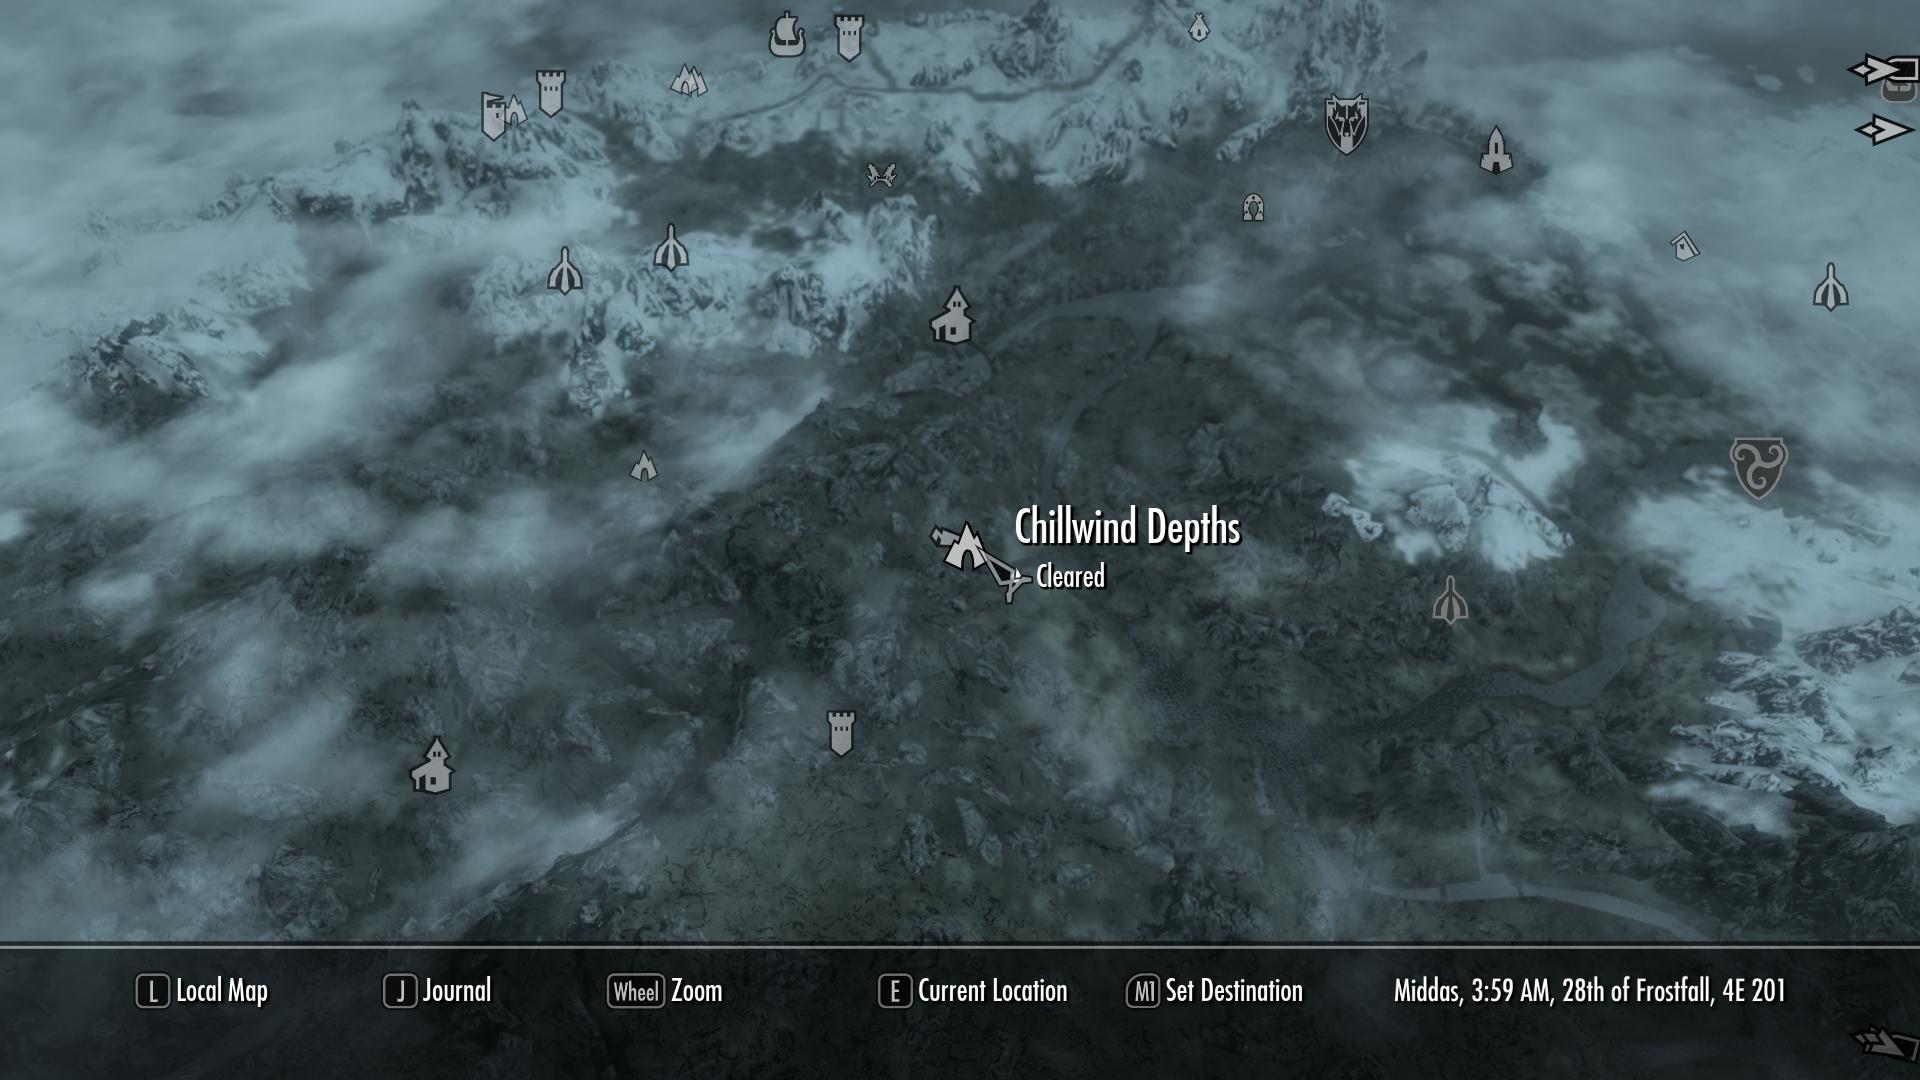 Chillwind Depths   Elder Scrolls   FANDOM powered by Wikia